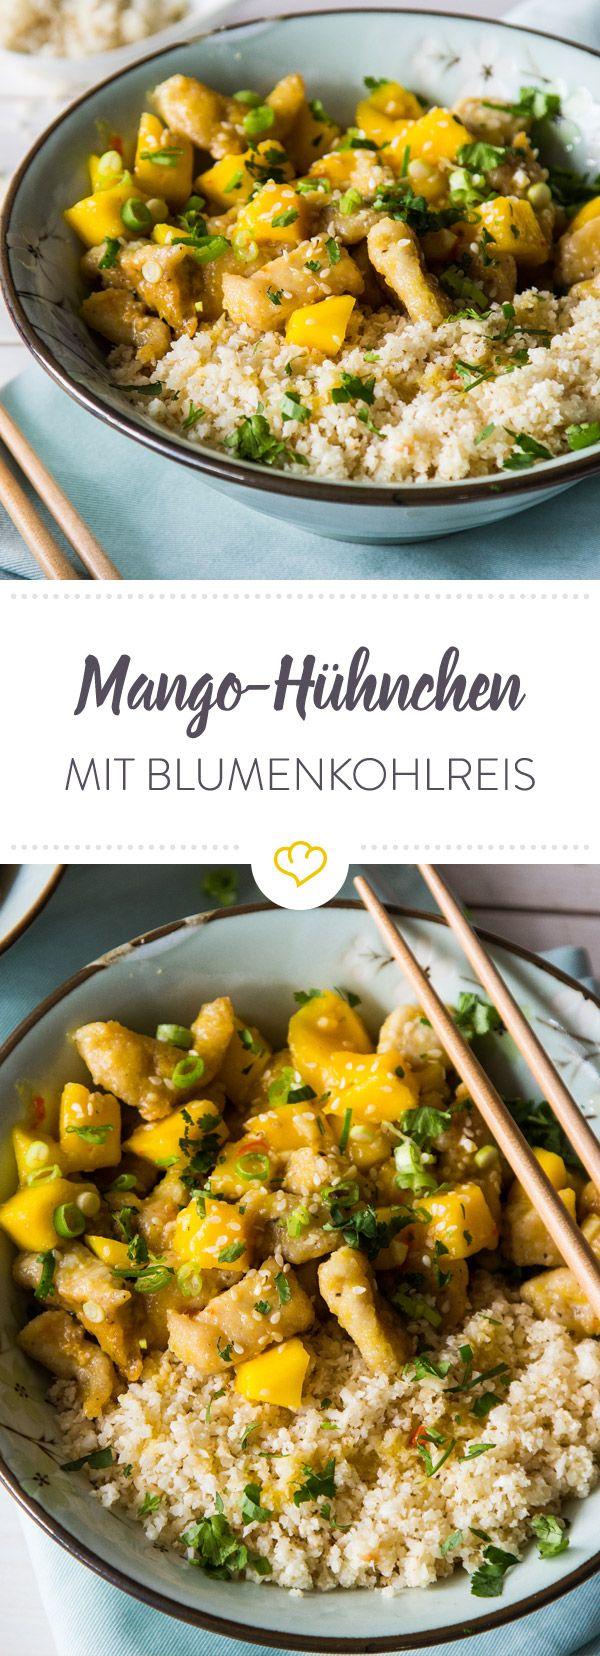 Mango-Hühnchen mit Blumenkohlreis #chickenalfredo